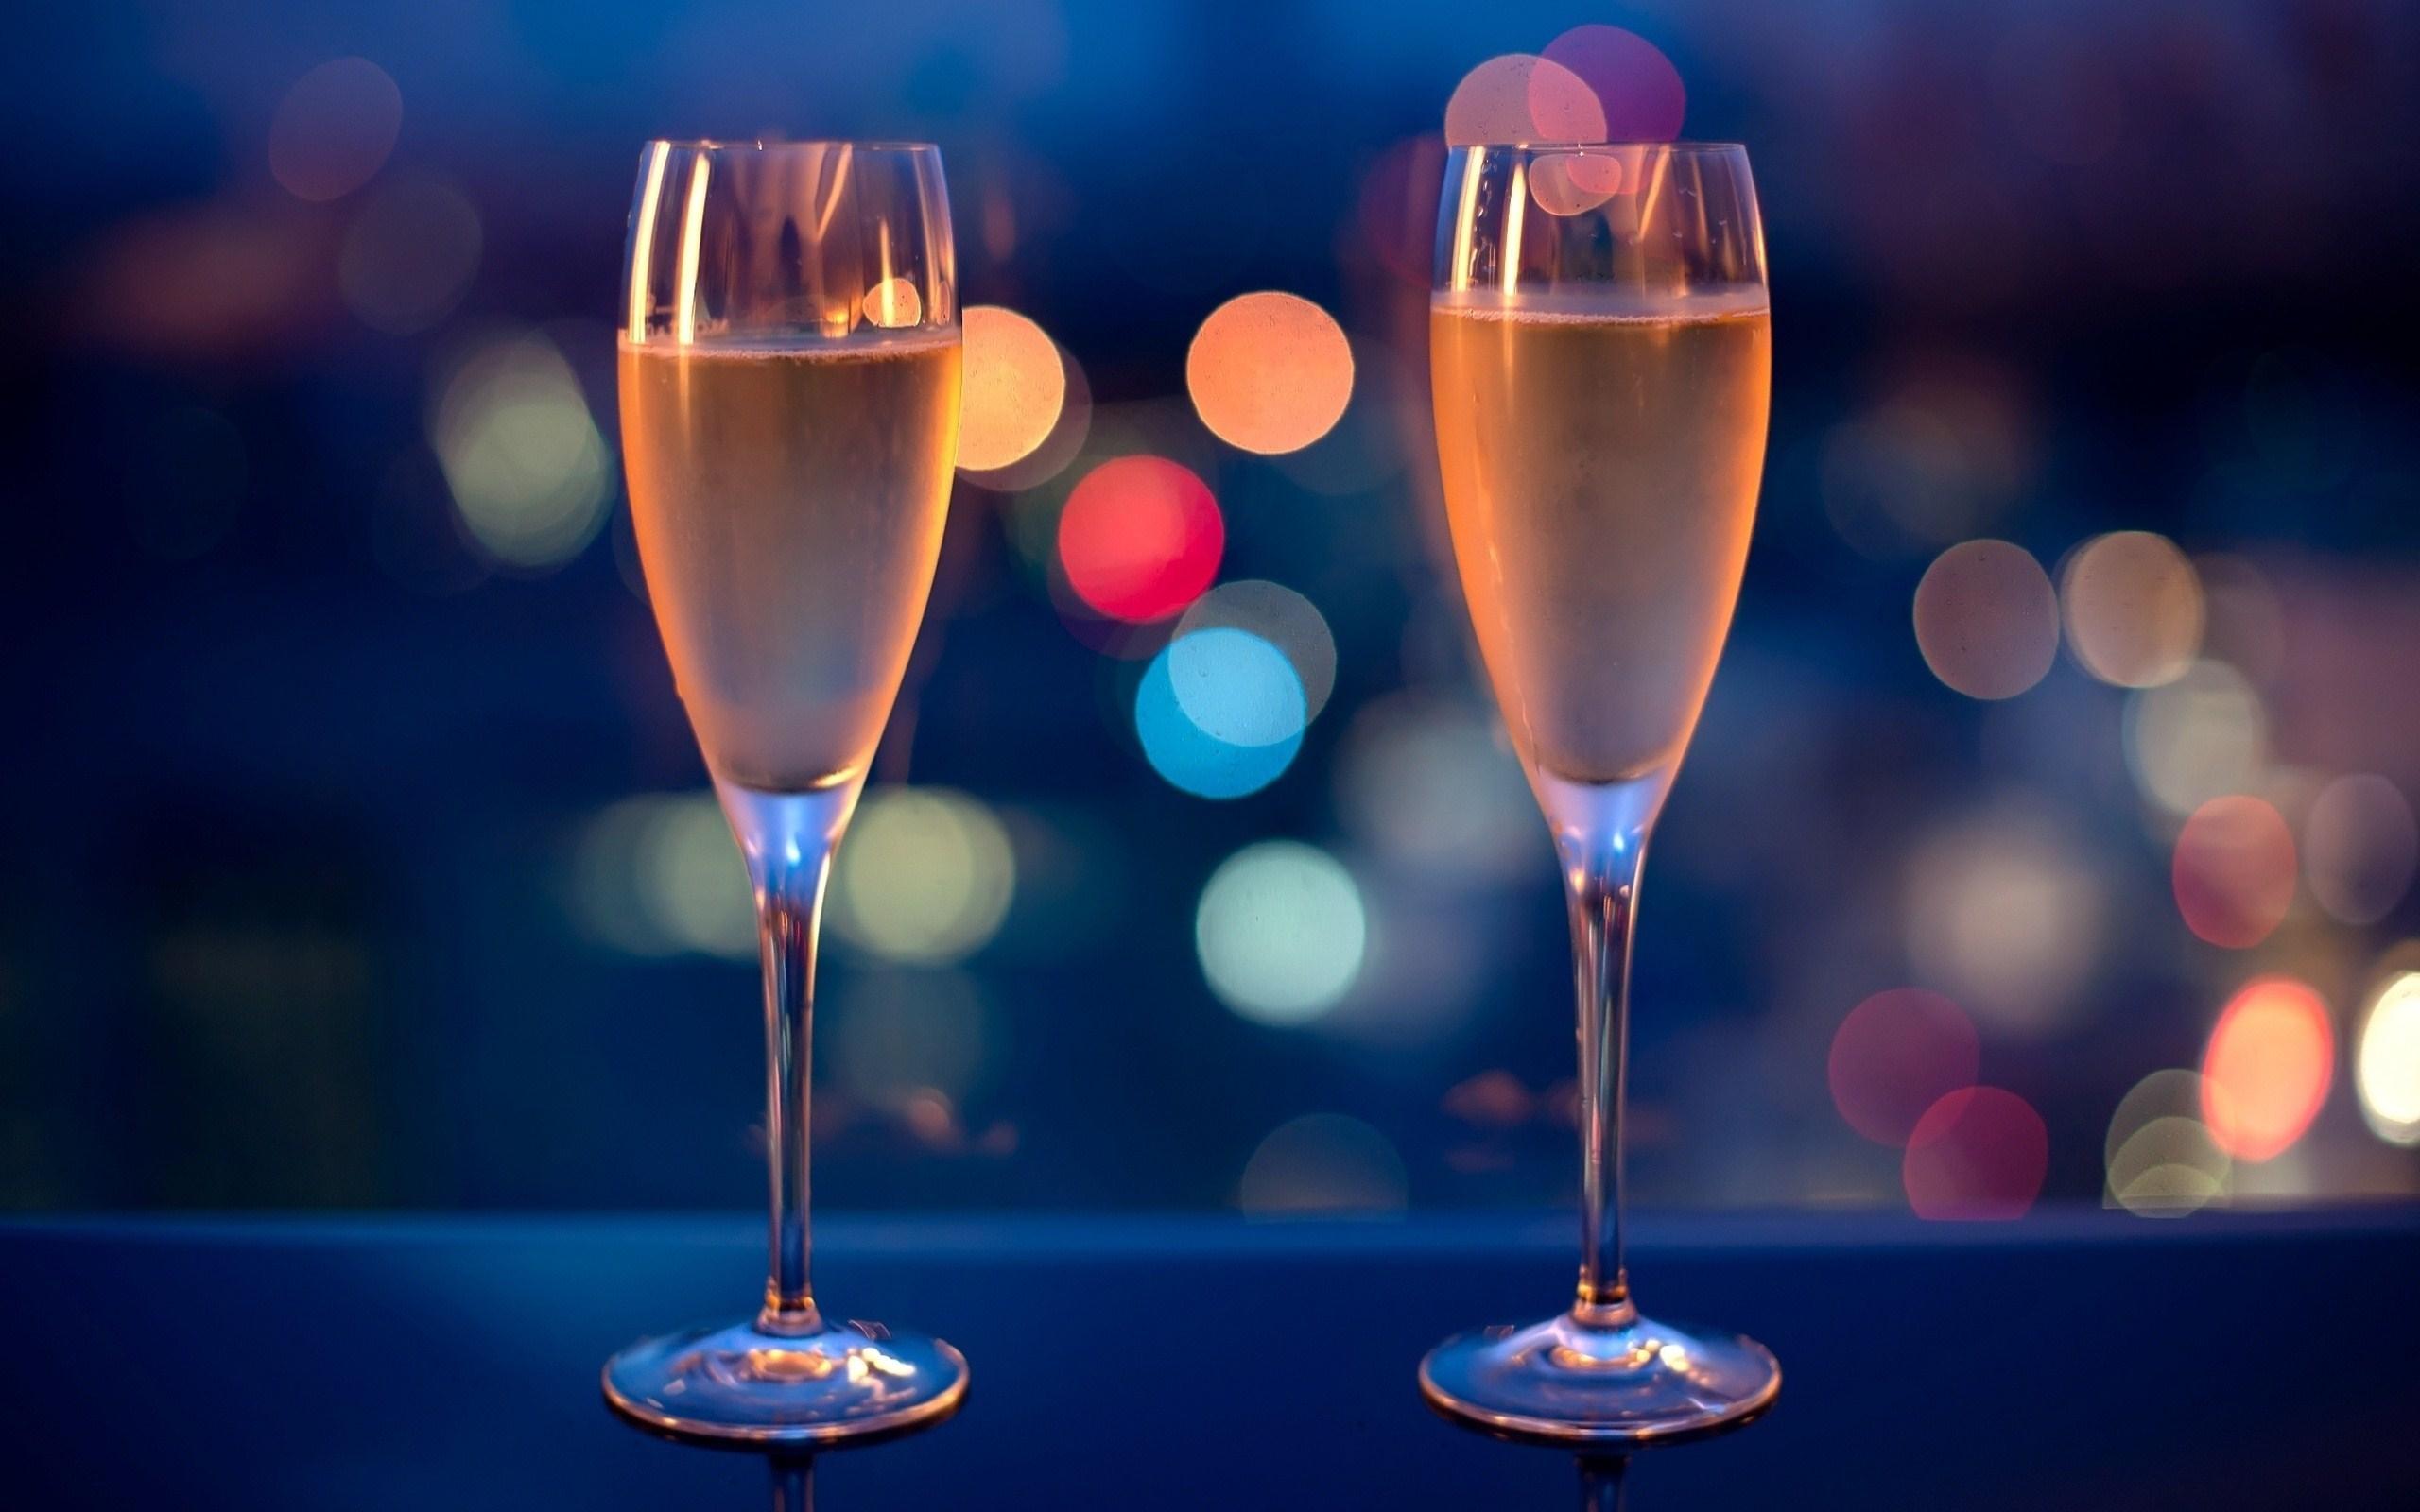 Night Lights Champagne Glasses Photo